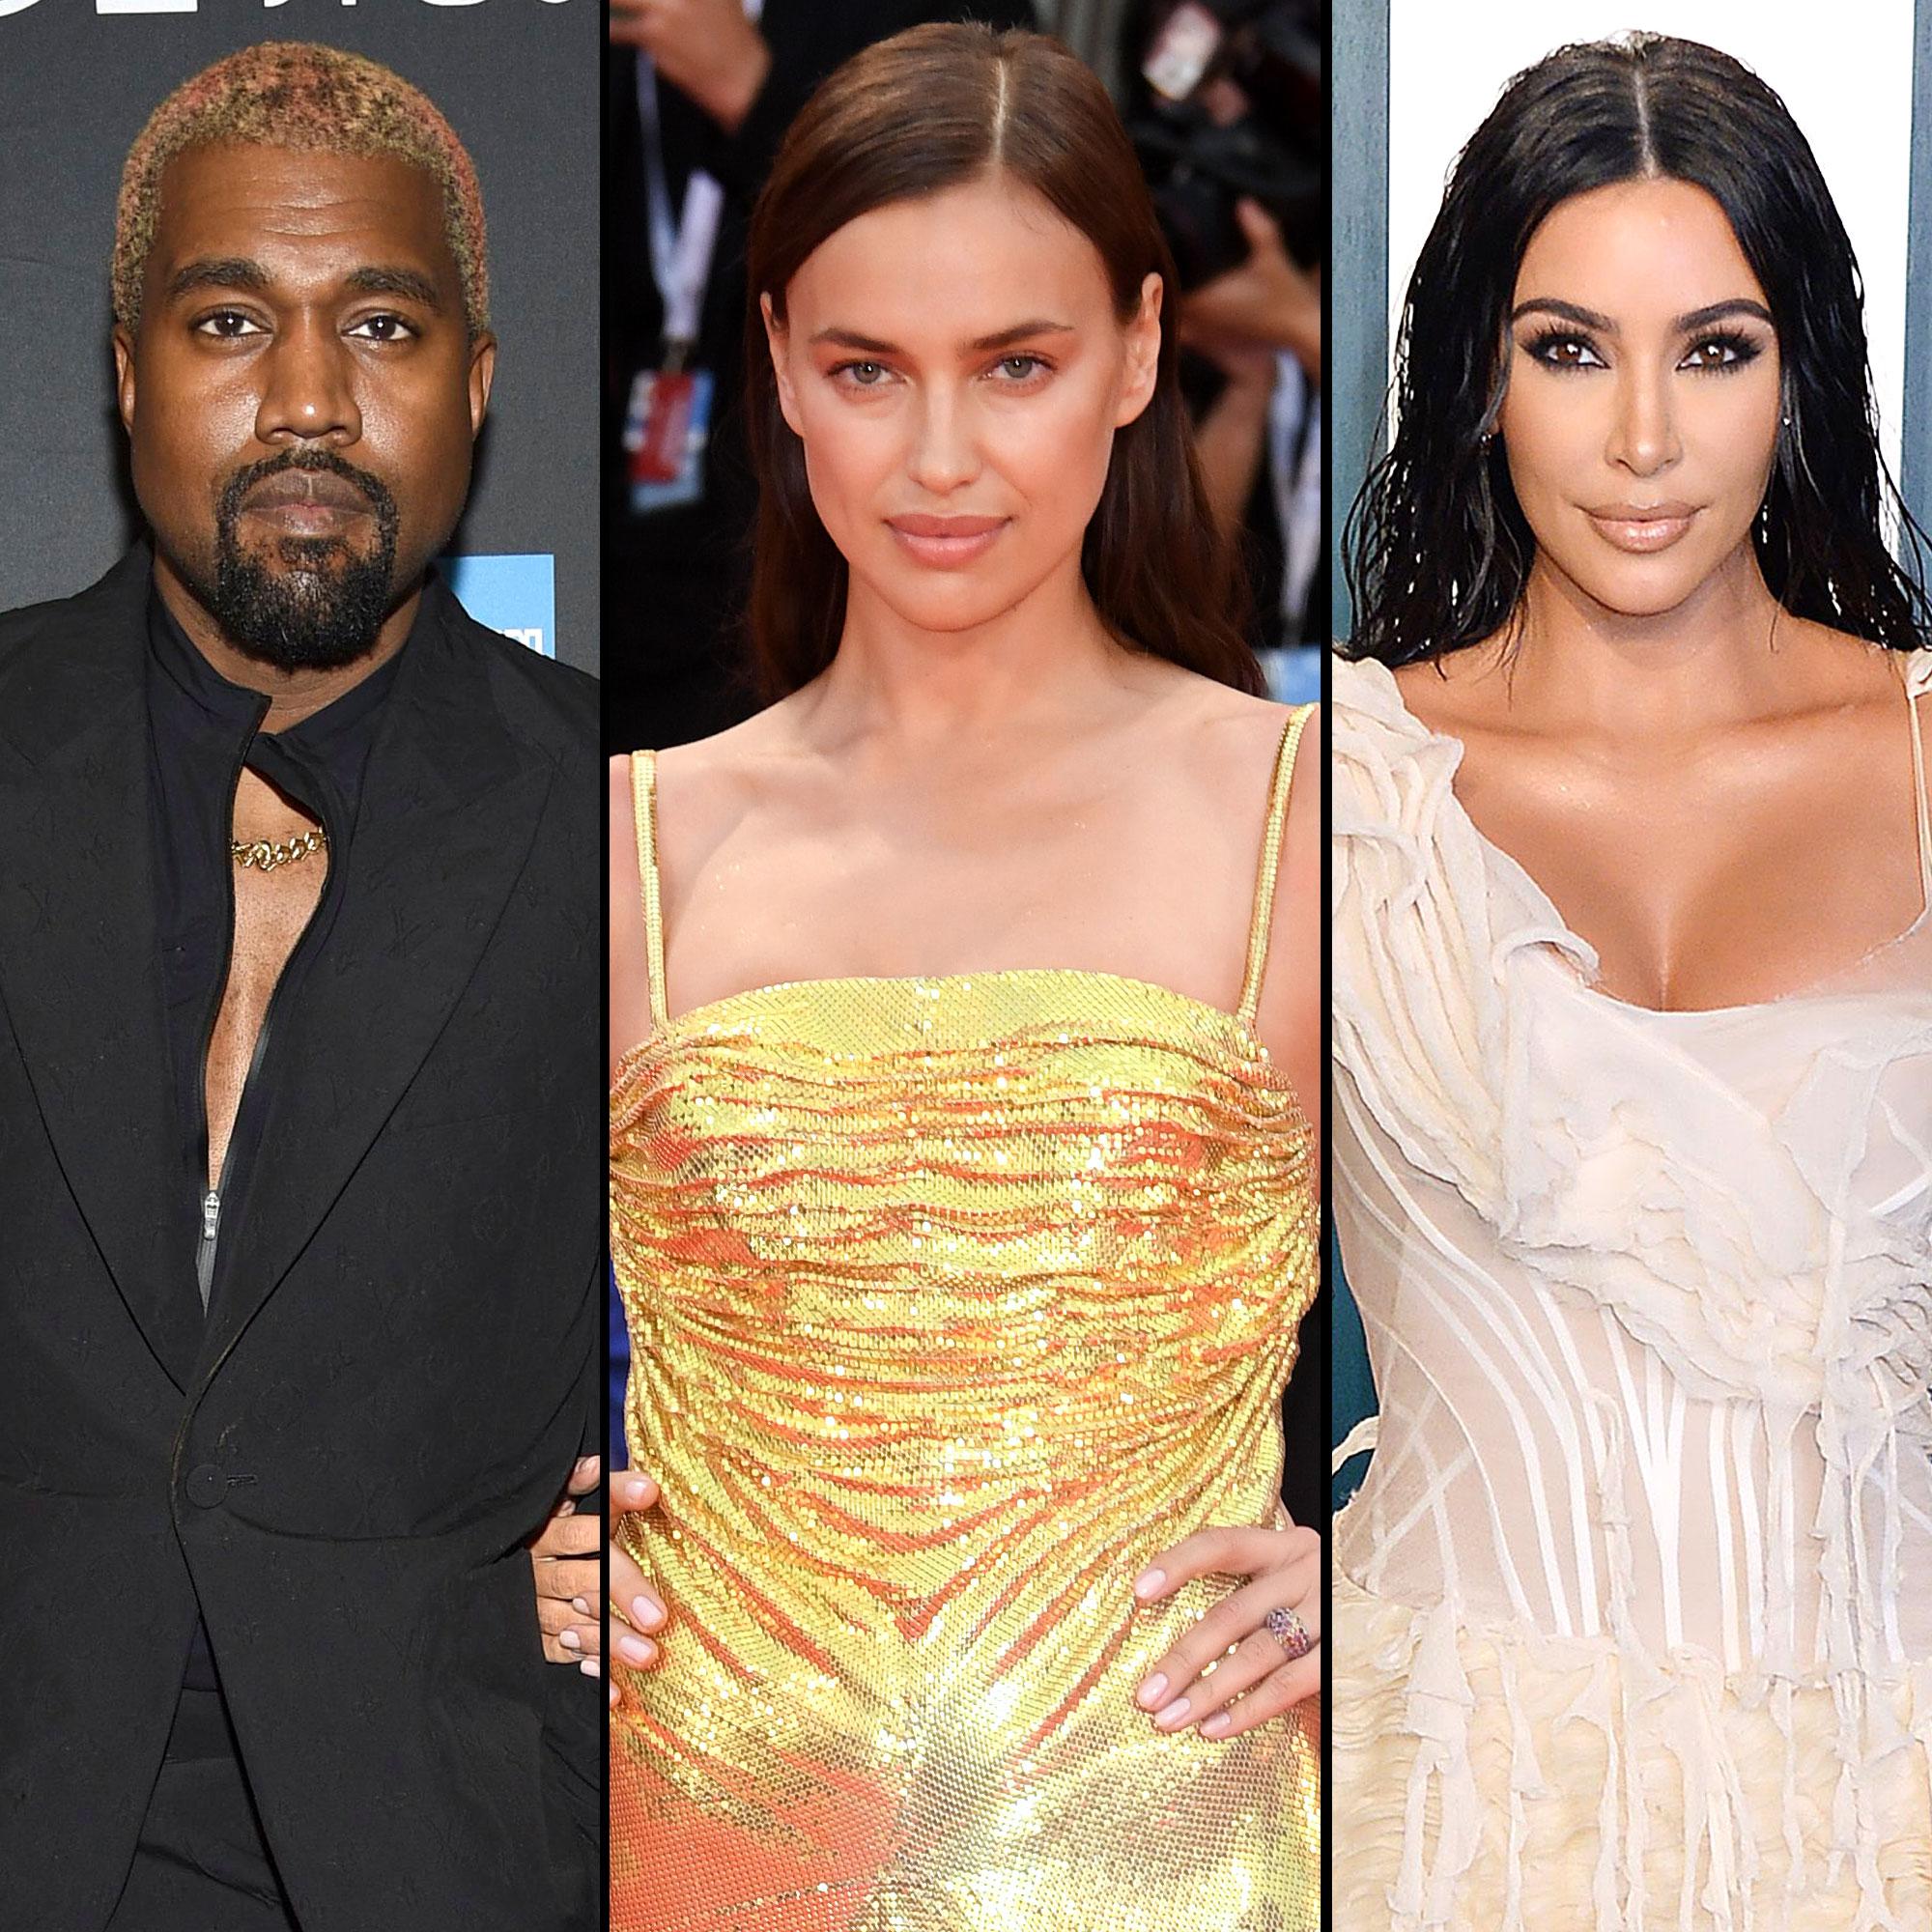 Kanye West Is Dating Irina Shayk Amid Kim Kardashian Divorce